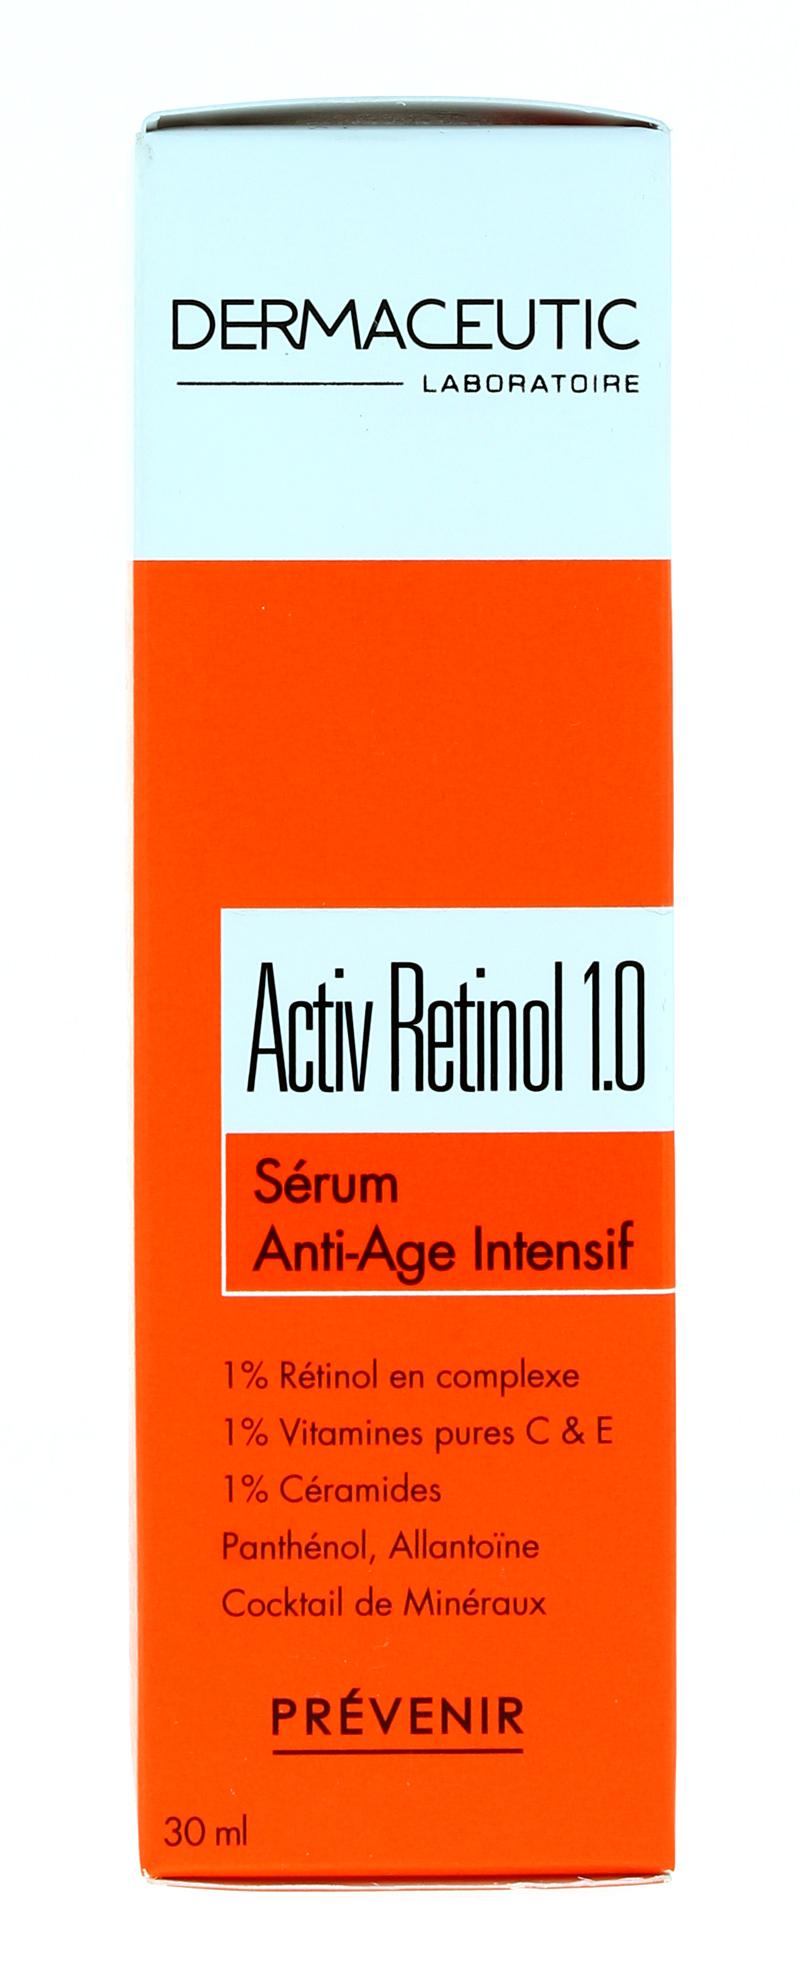 Dermaceutic C Turn Over Crme de Nuit 40ml